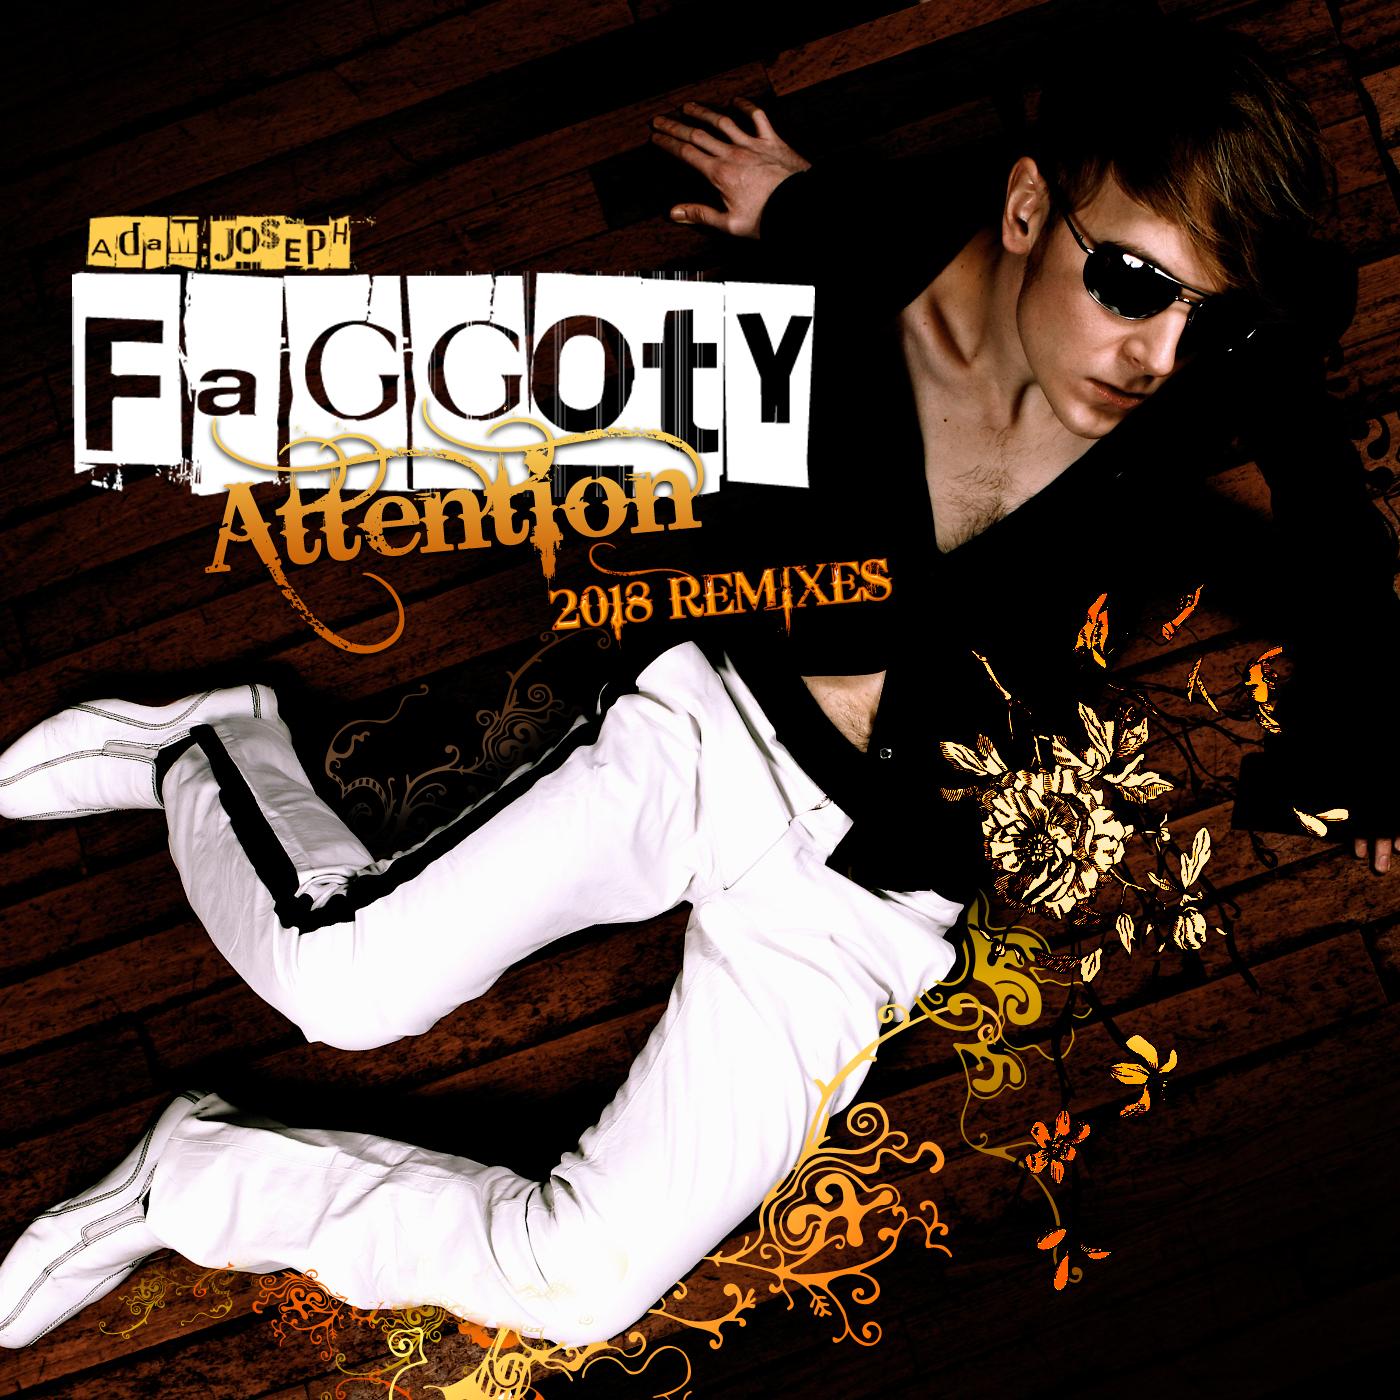 Adam Joseph - Faggoty Attention (2018 Remixes)